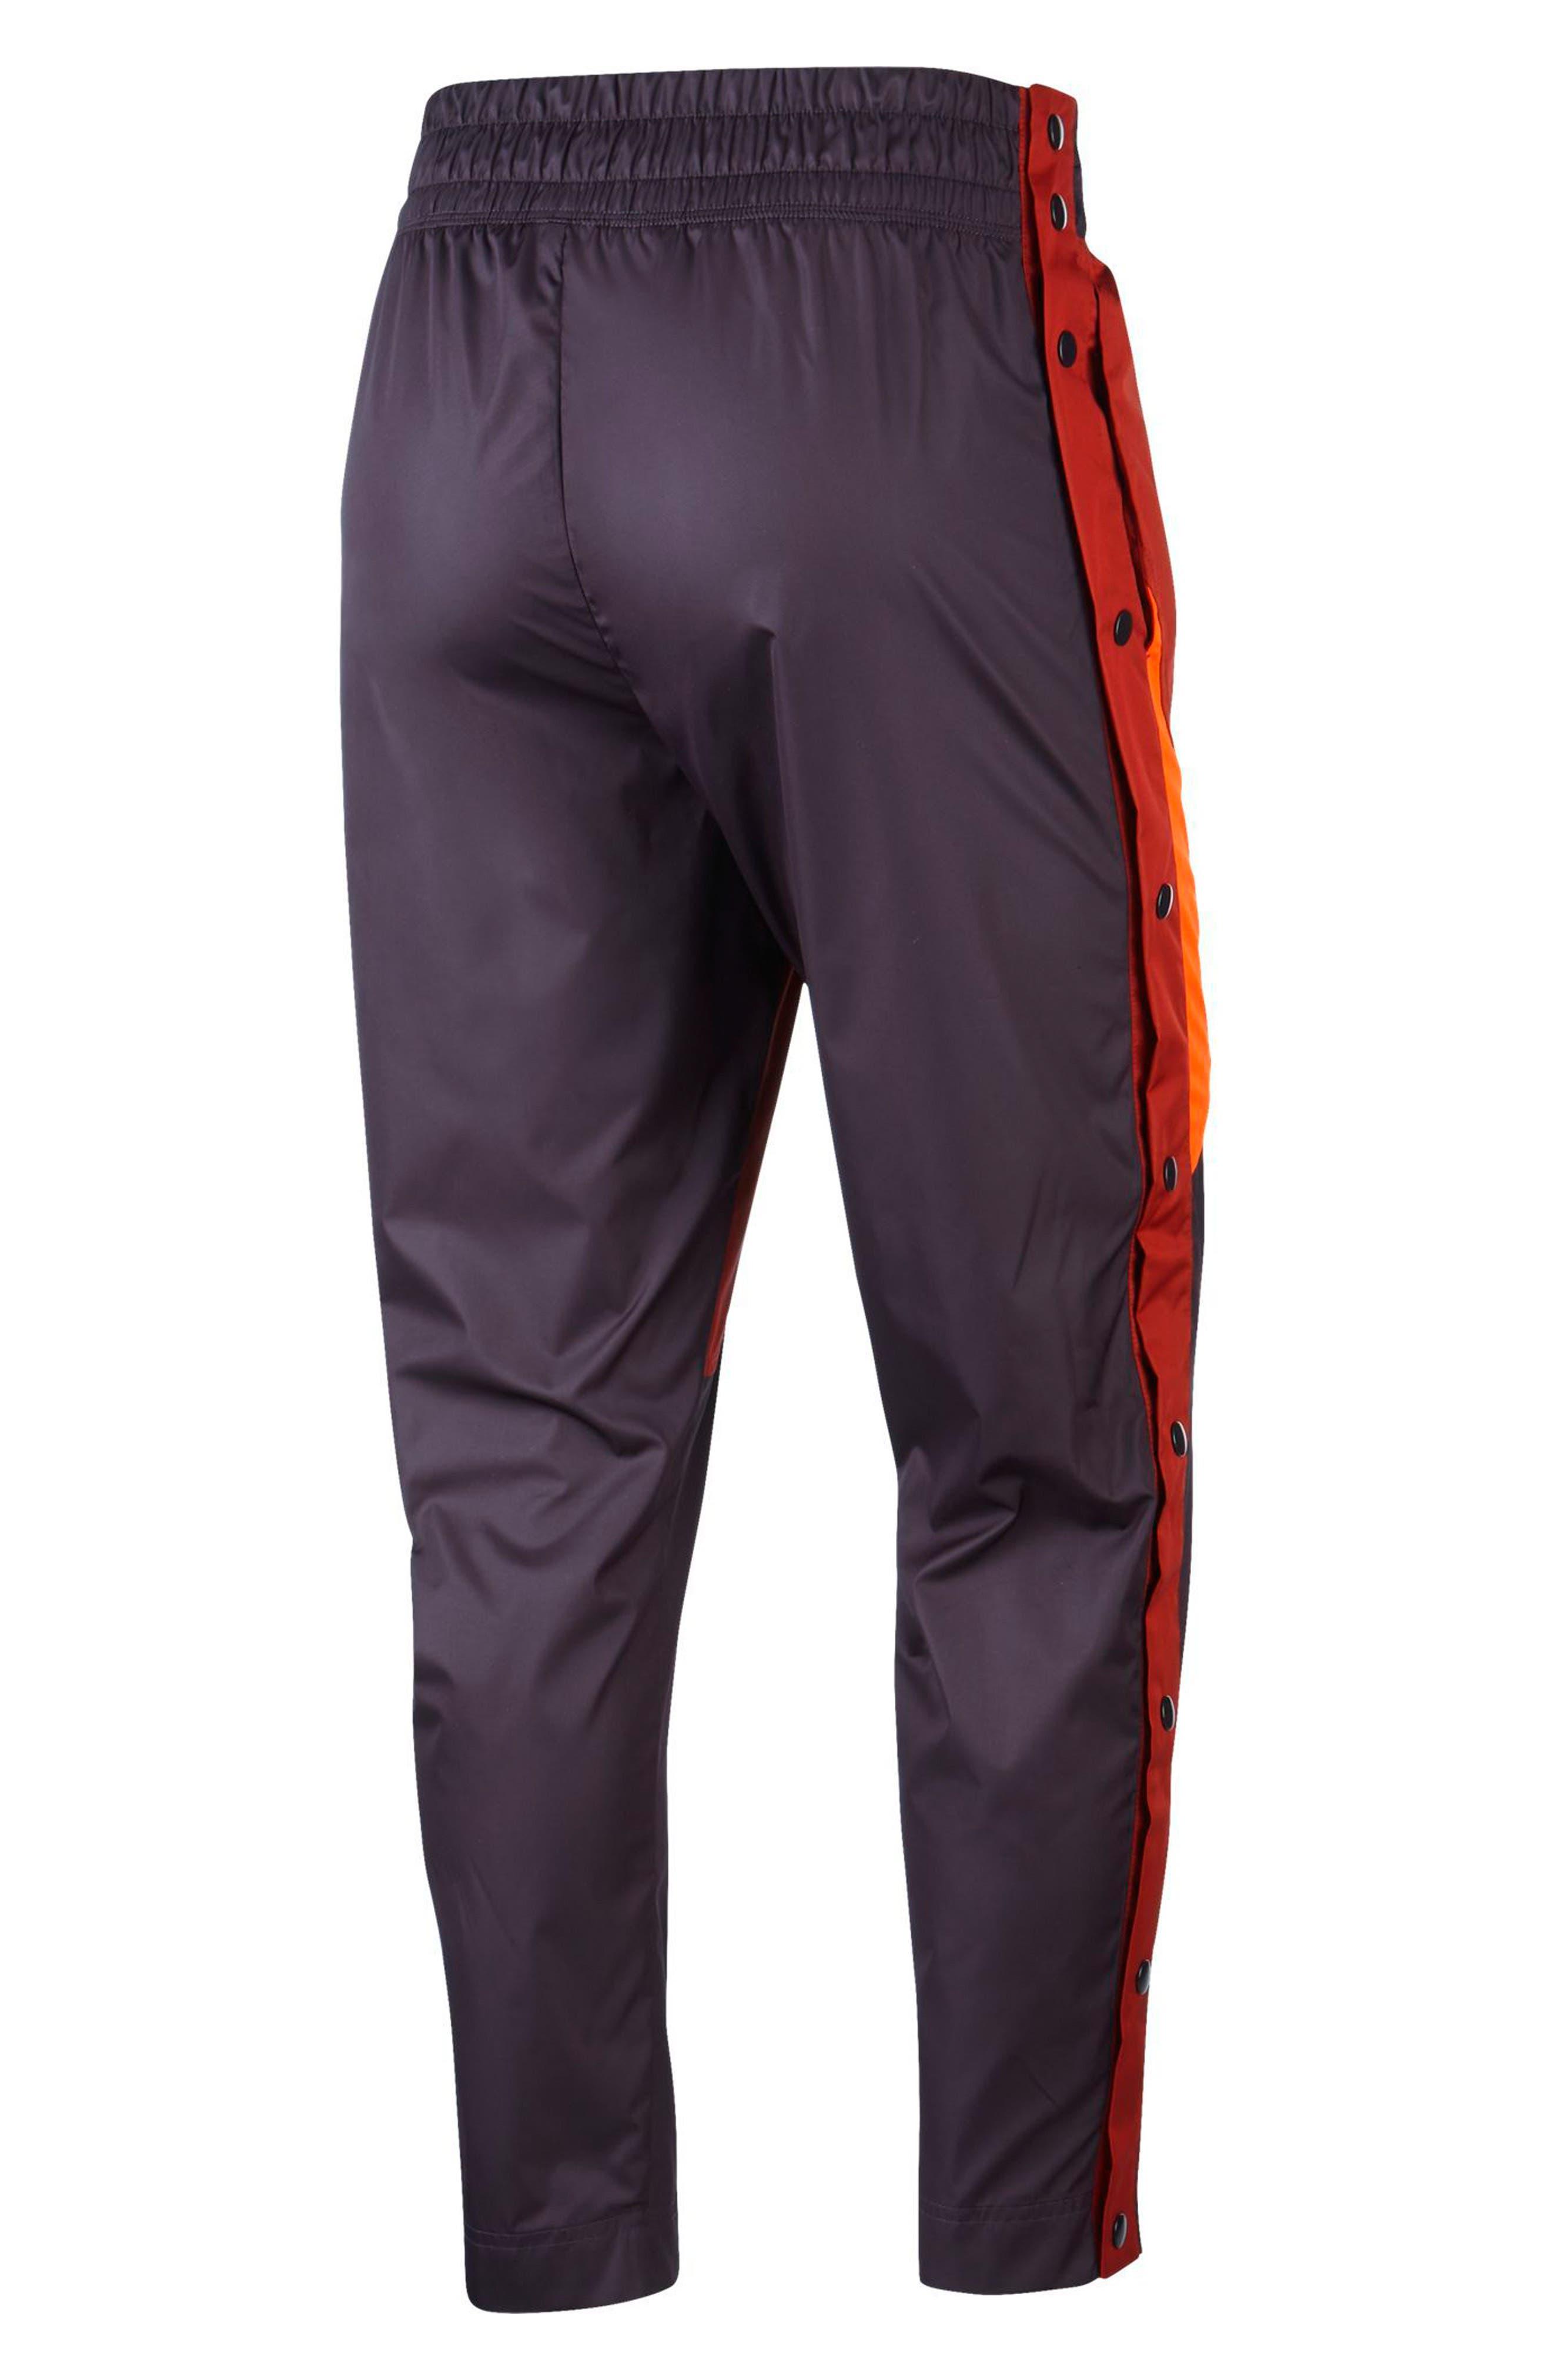 Sportswear Tearaway Woven Pants,                             Alternate thumbnail 4, color,